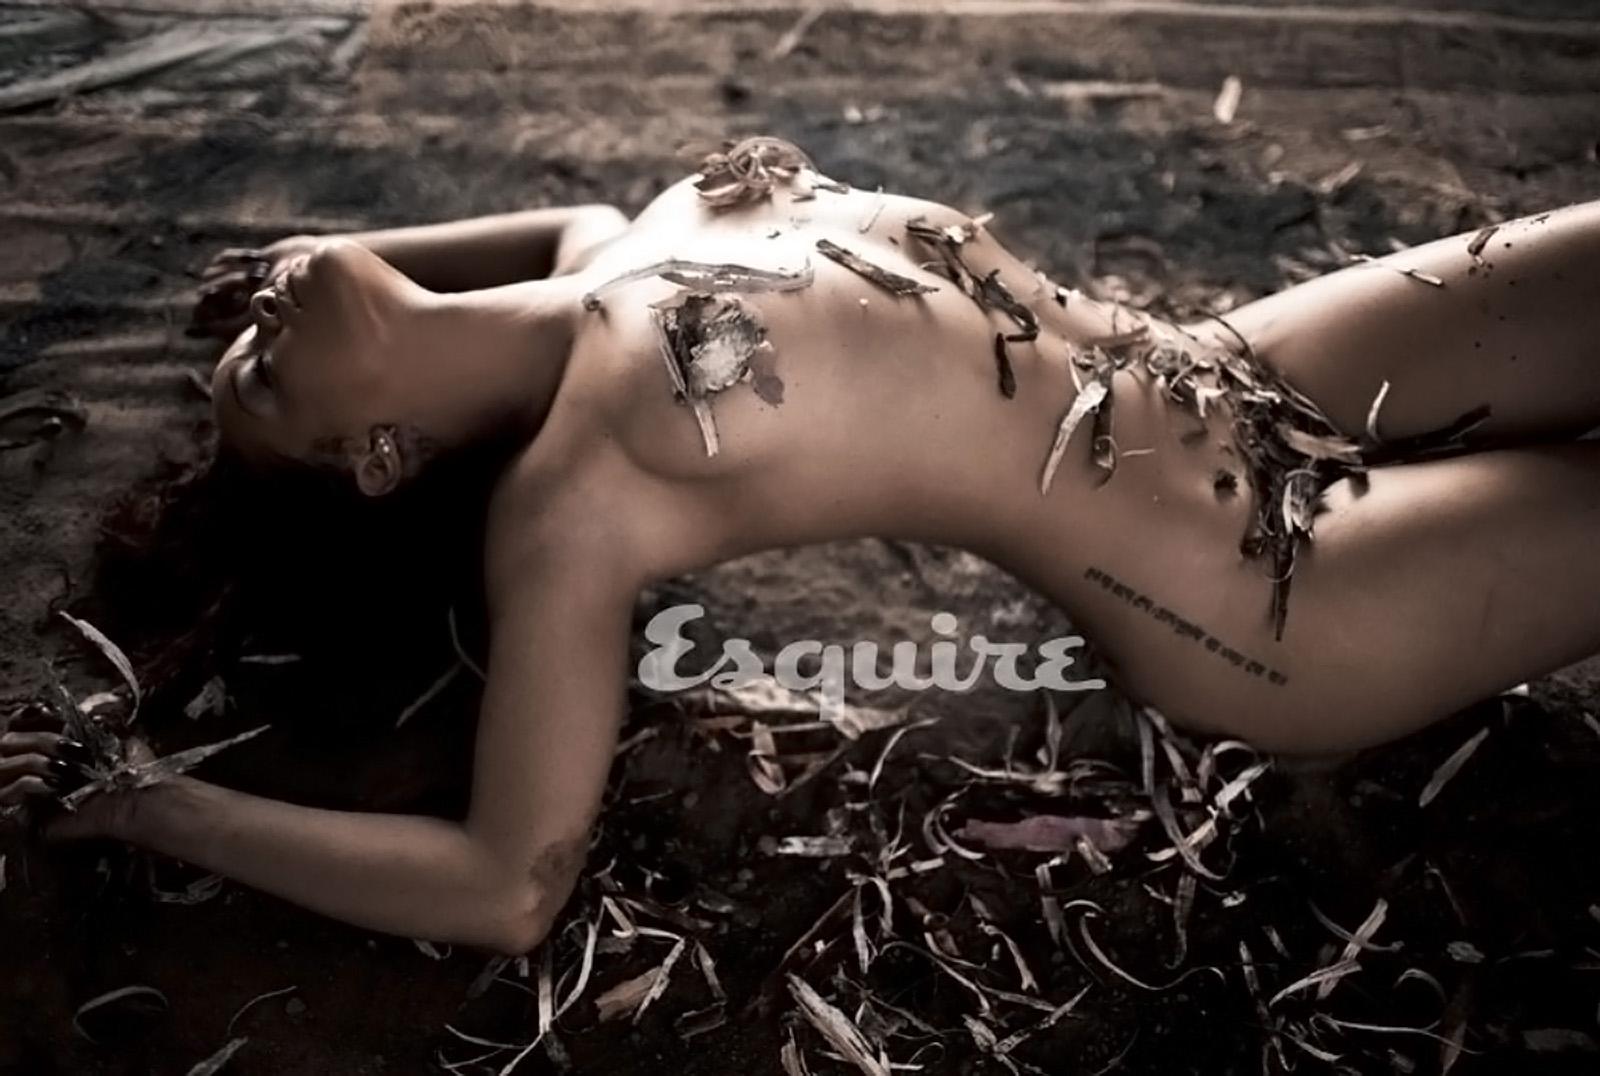 http://4.bp.blogspot.com/-0v7J9QJ8HUE/TpRVD2F3V8I/AAAAAAAACSc/dzH1MwXkBYI/s1600/Rihanna+nude+in+Esquire+November+2011+hot+naked+1.jpg